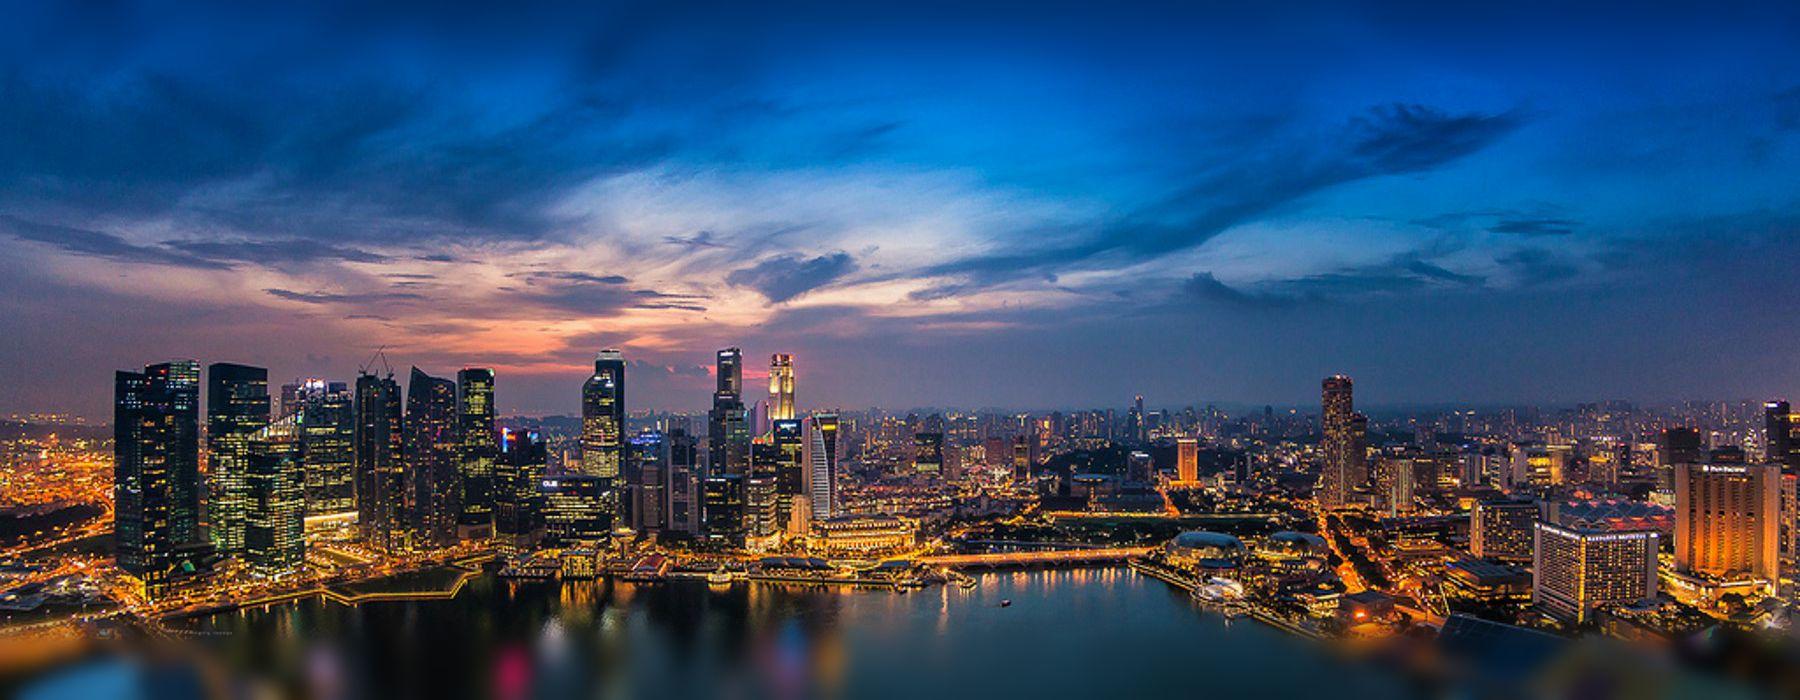 pachet turistic Simply Singapore cover